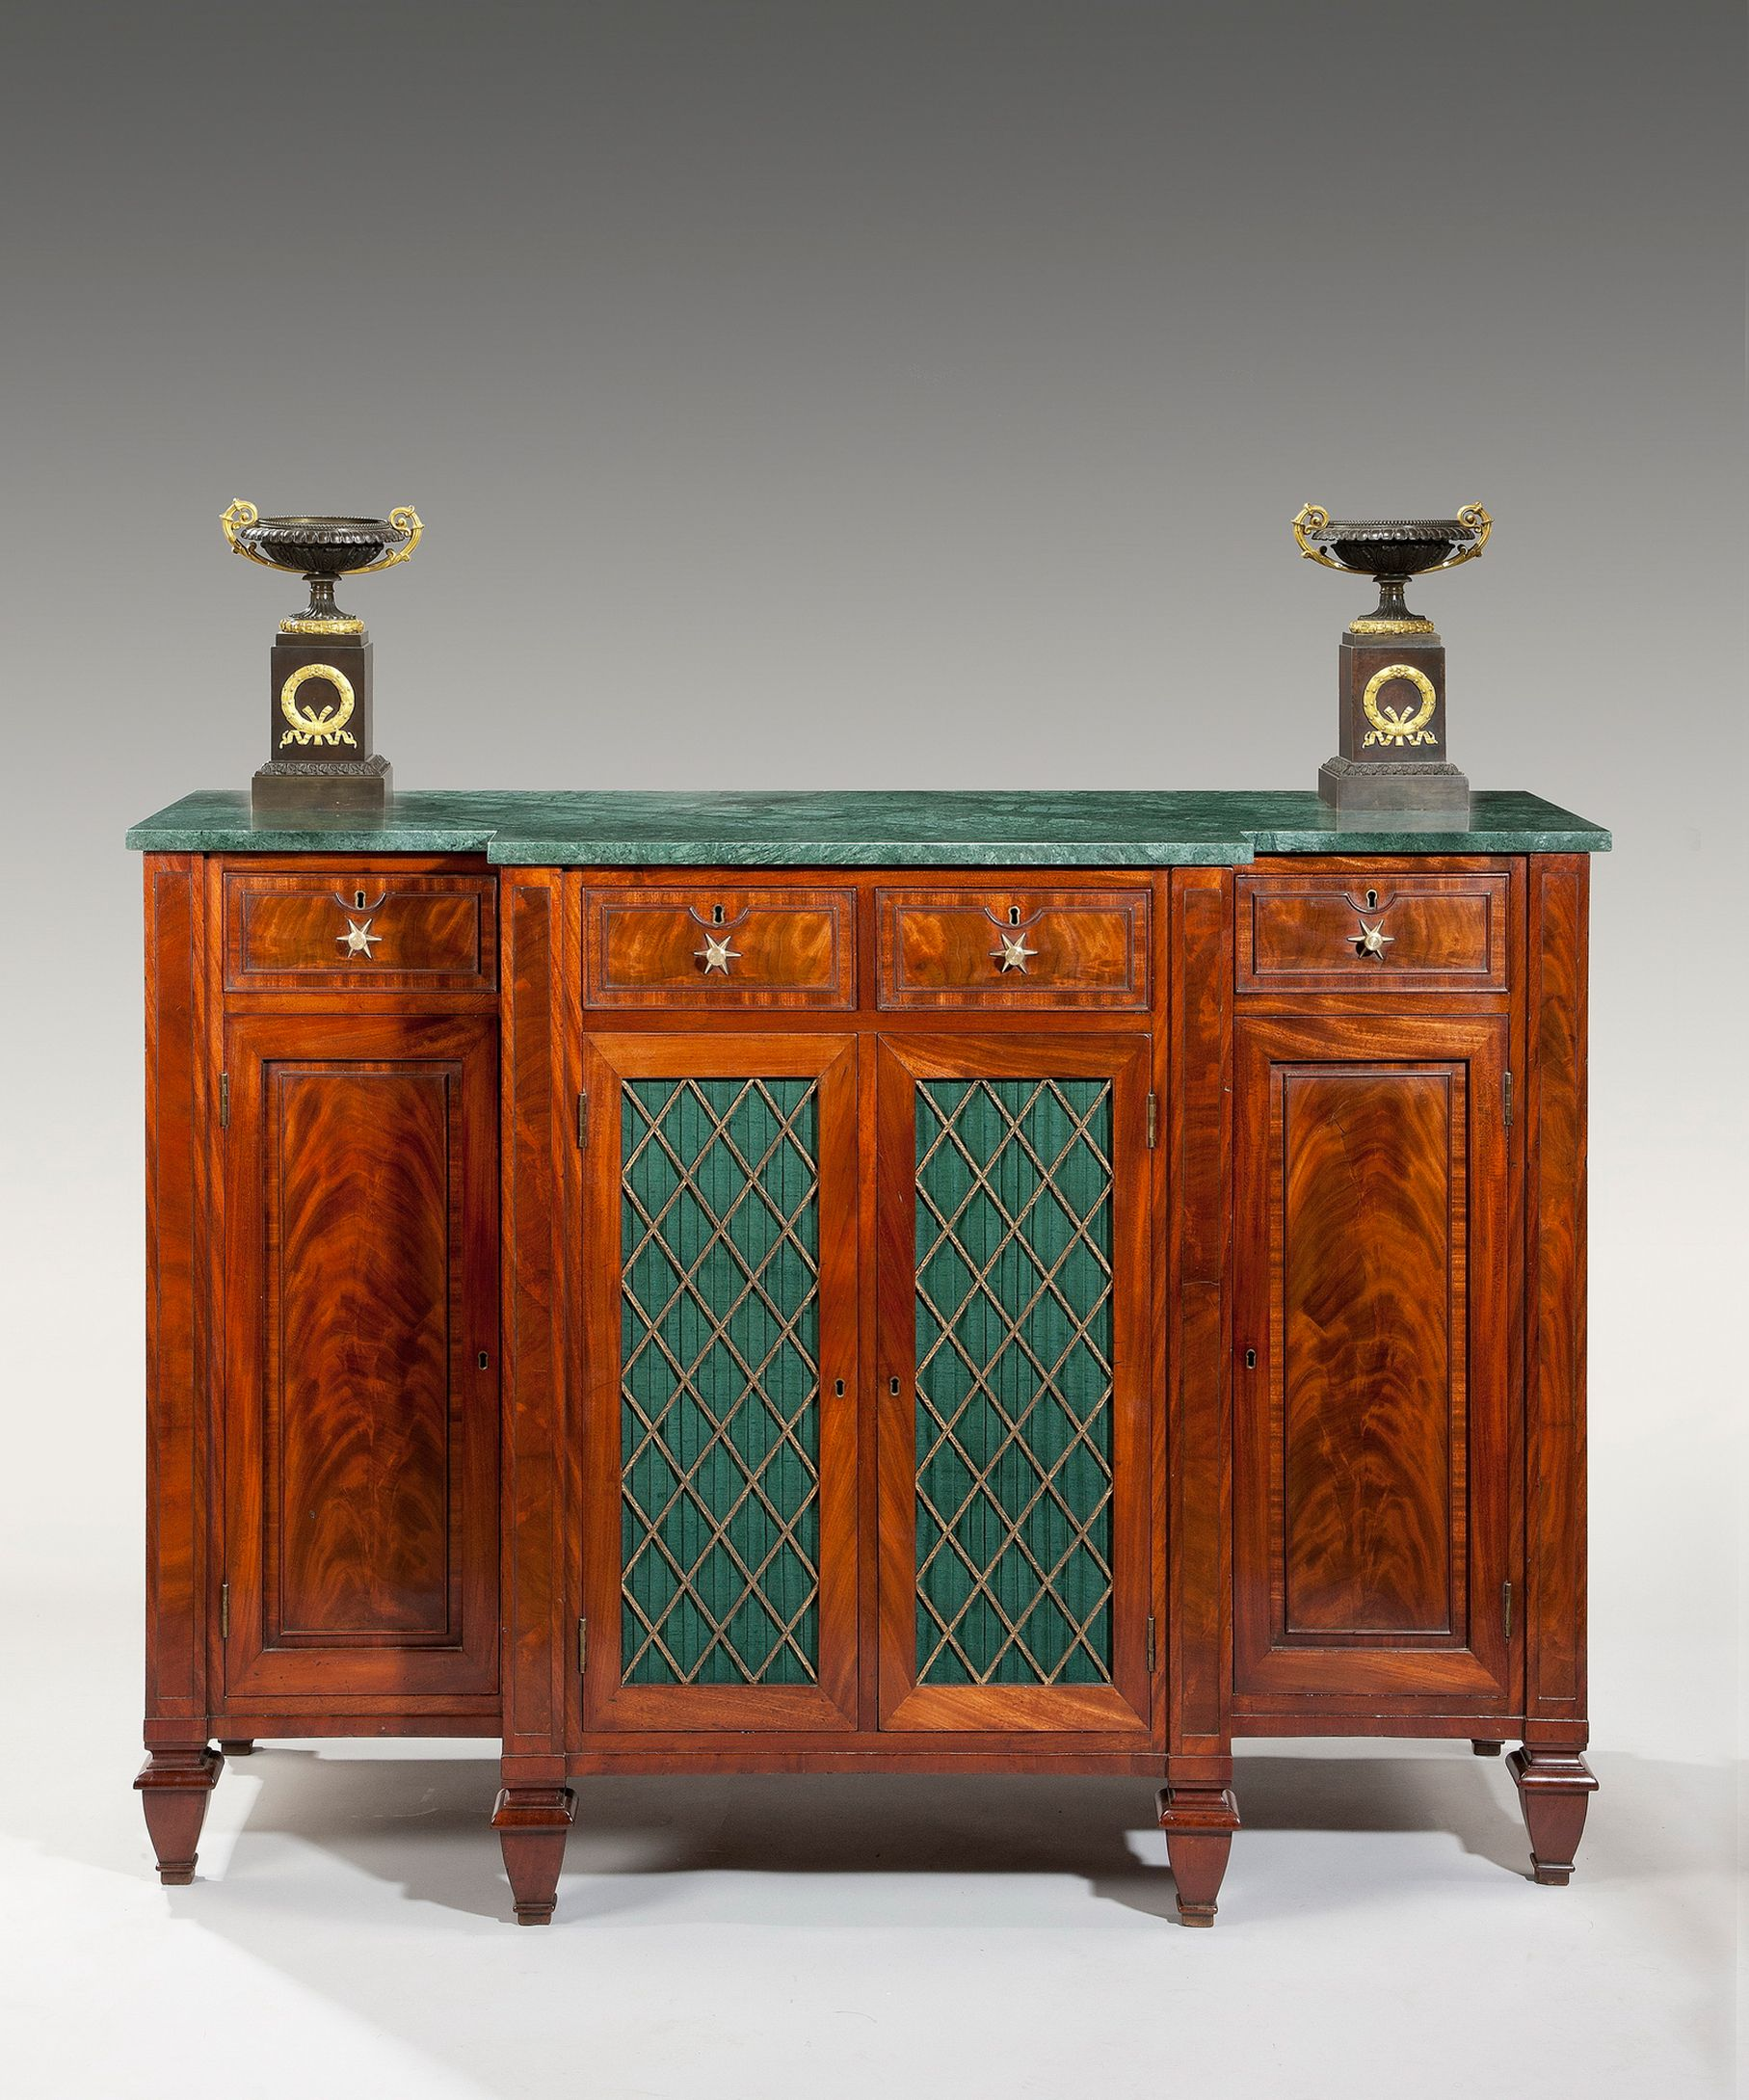 English Antique Georgian Furniture Reindeer Antiques Mobilier De Salon Idees De Meubles Art